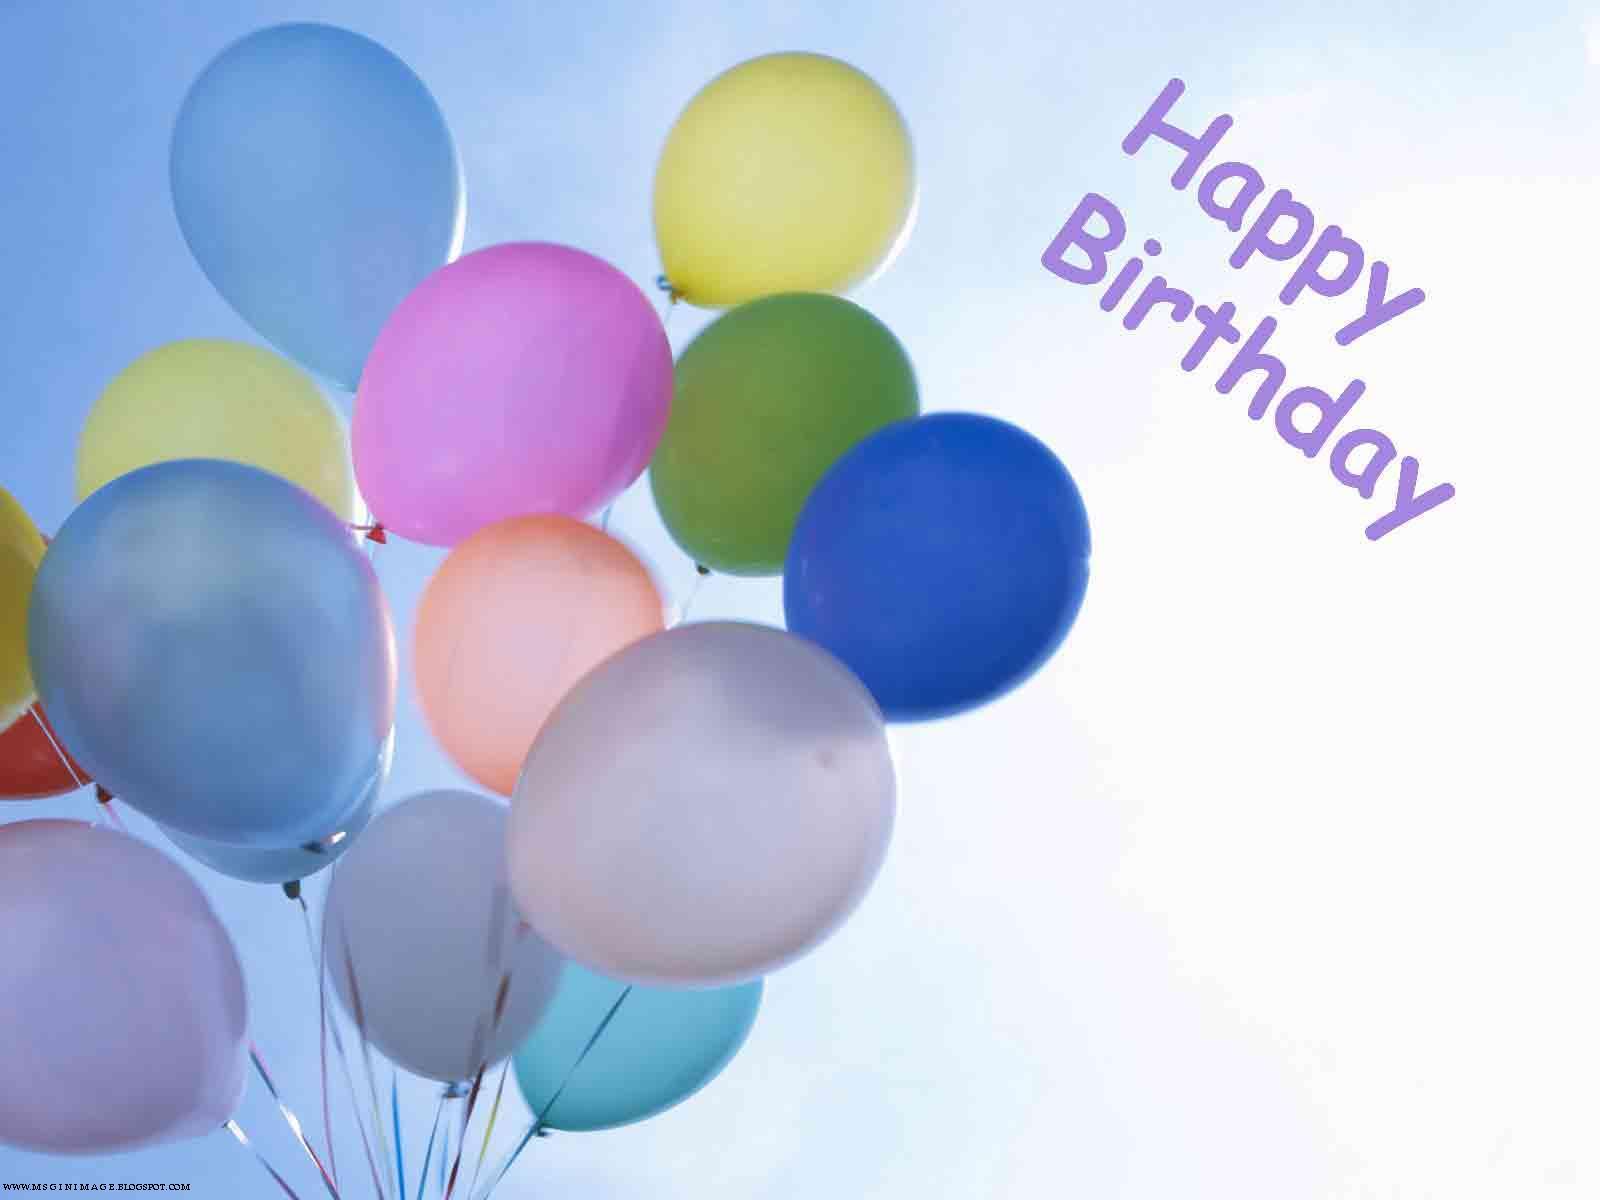 happy birthday wish you birthday card and message happy birthday 1600x1200